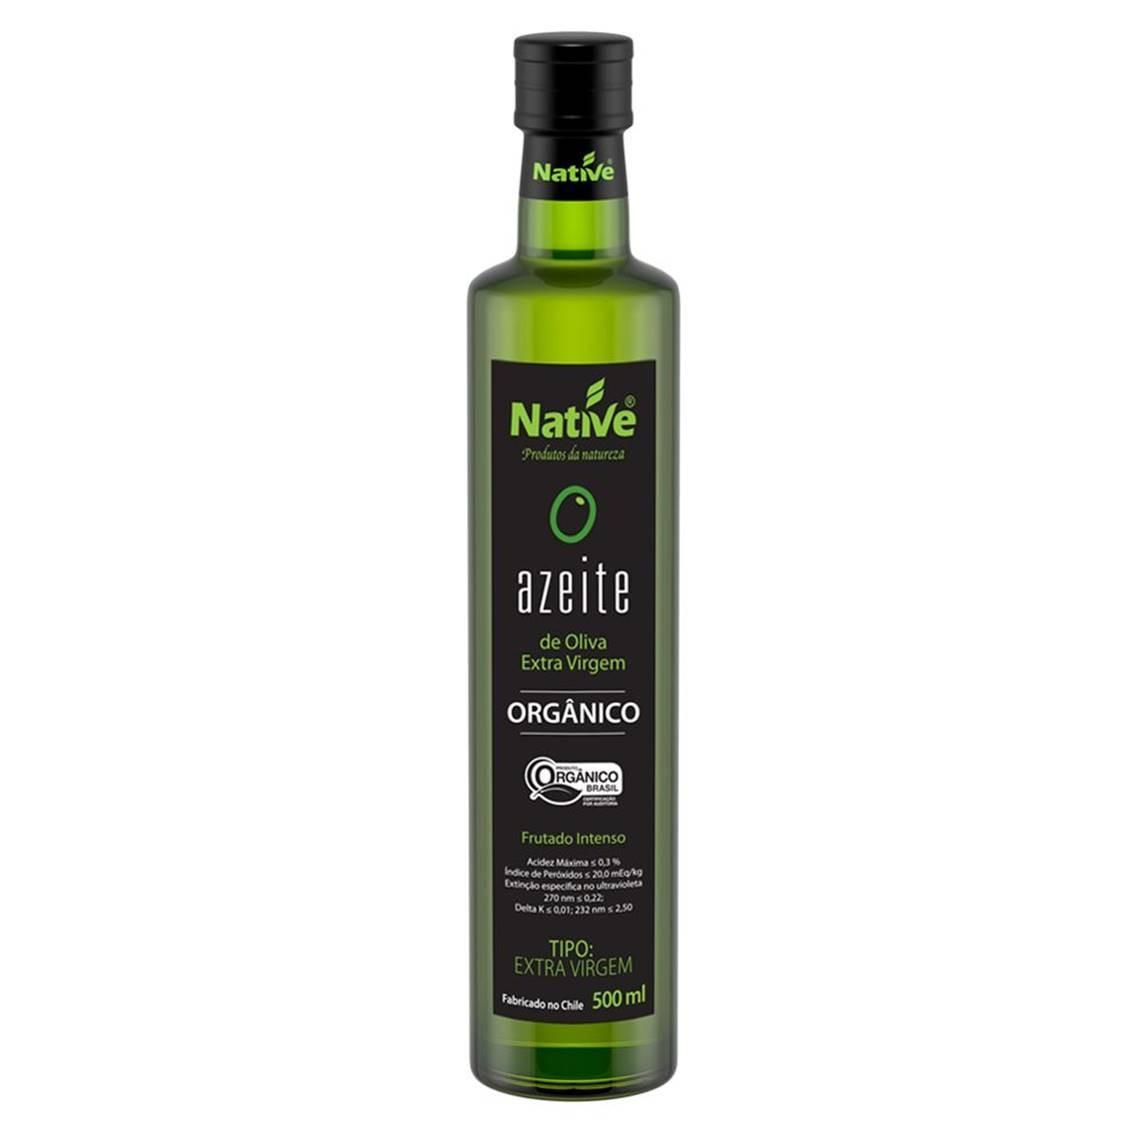 Azeite Extra Virgem (500ml) – Native